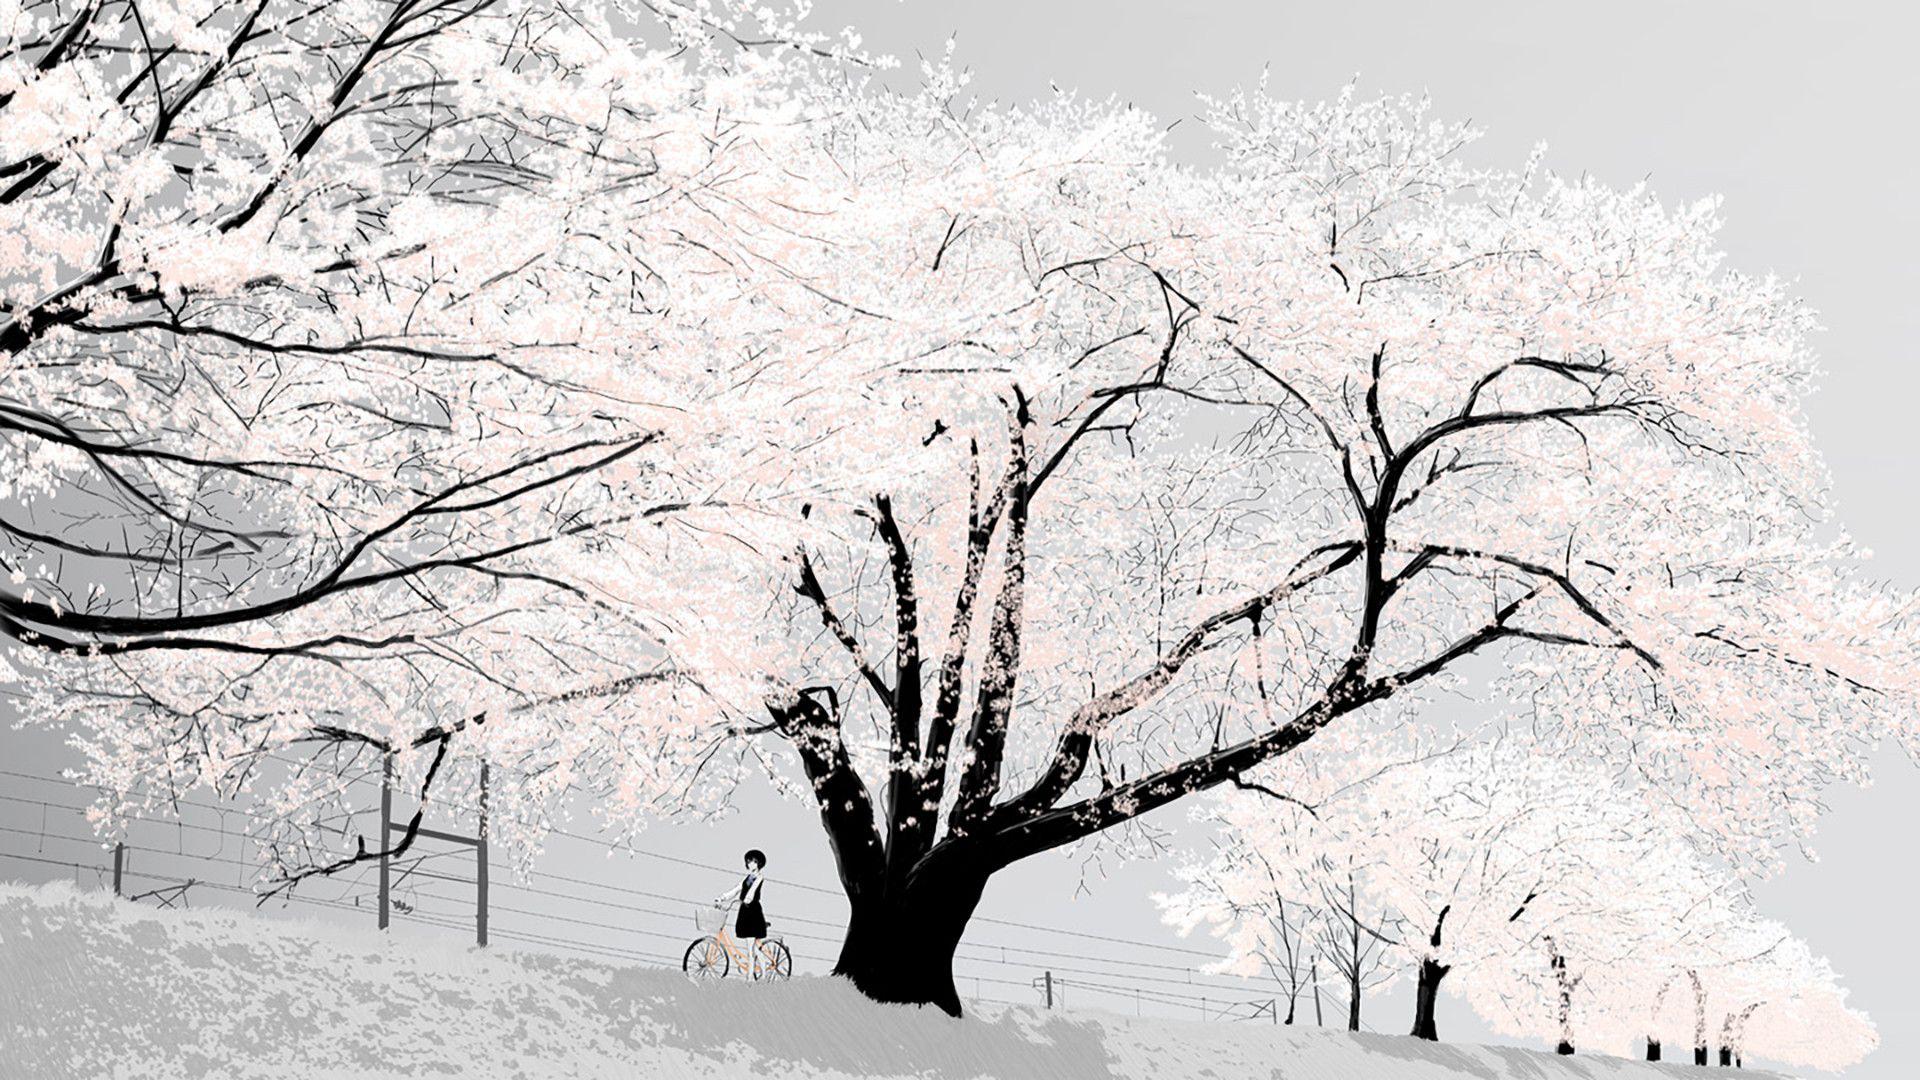 Discreet Anime Wallpapers Album On Imgur Artistic Wallpaper Scenery Anime Wallpaper Freezing anime desktop wallpaper